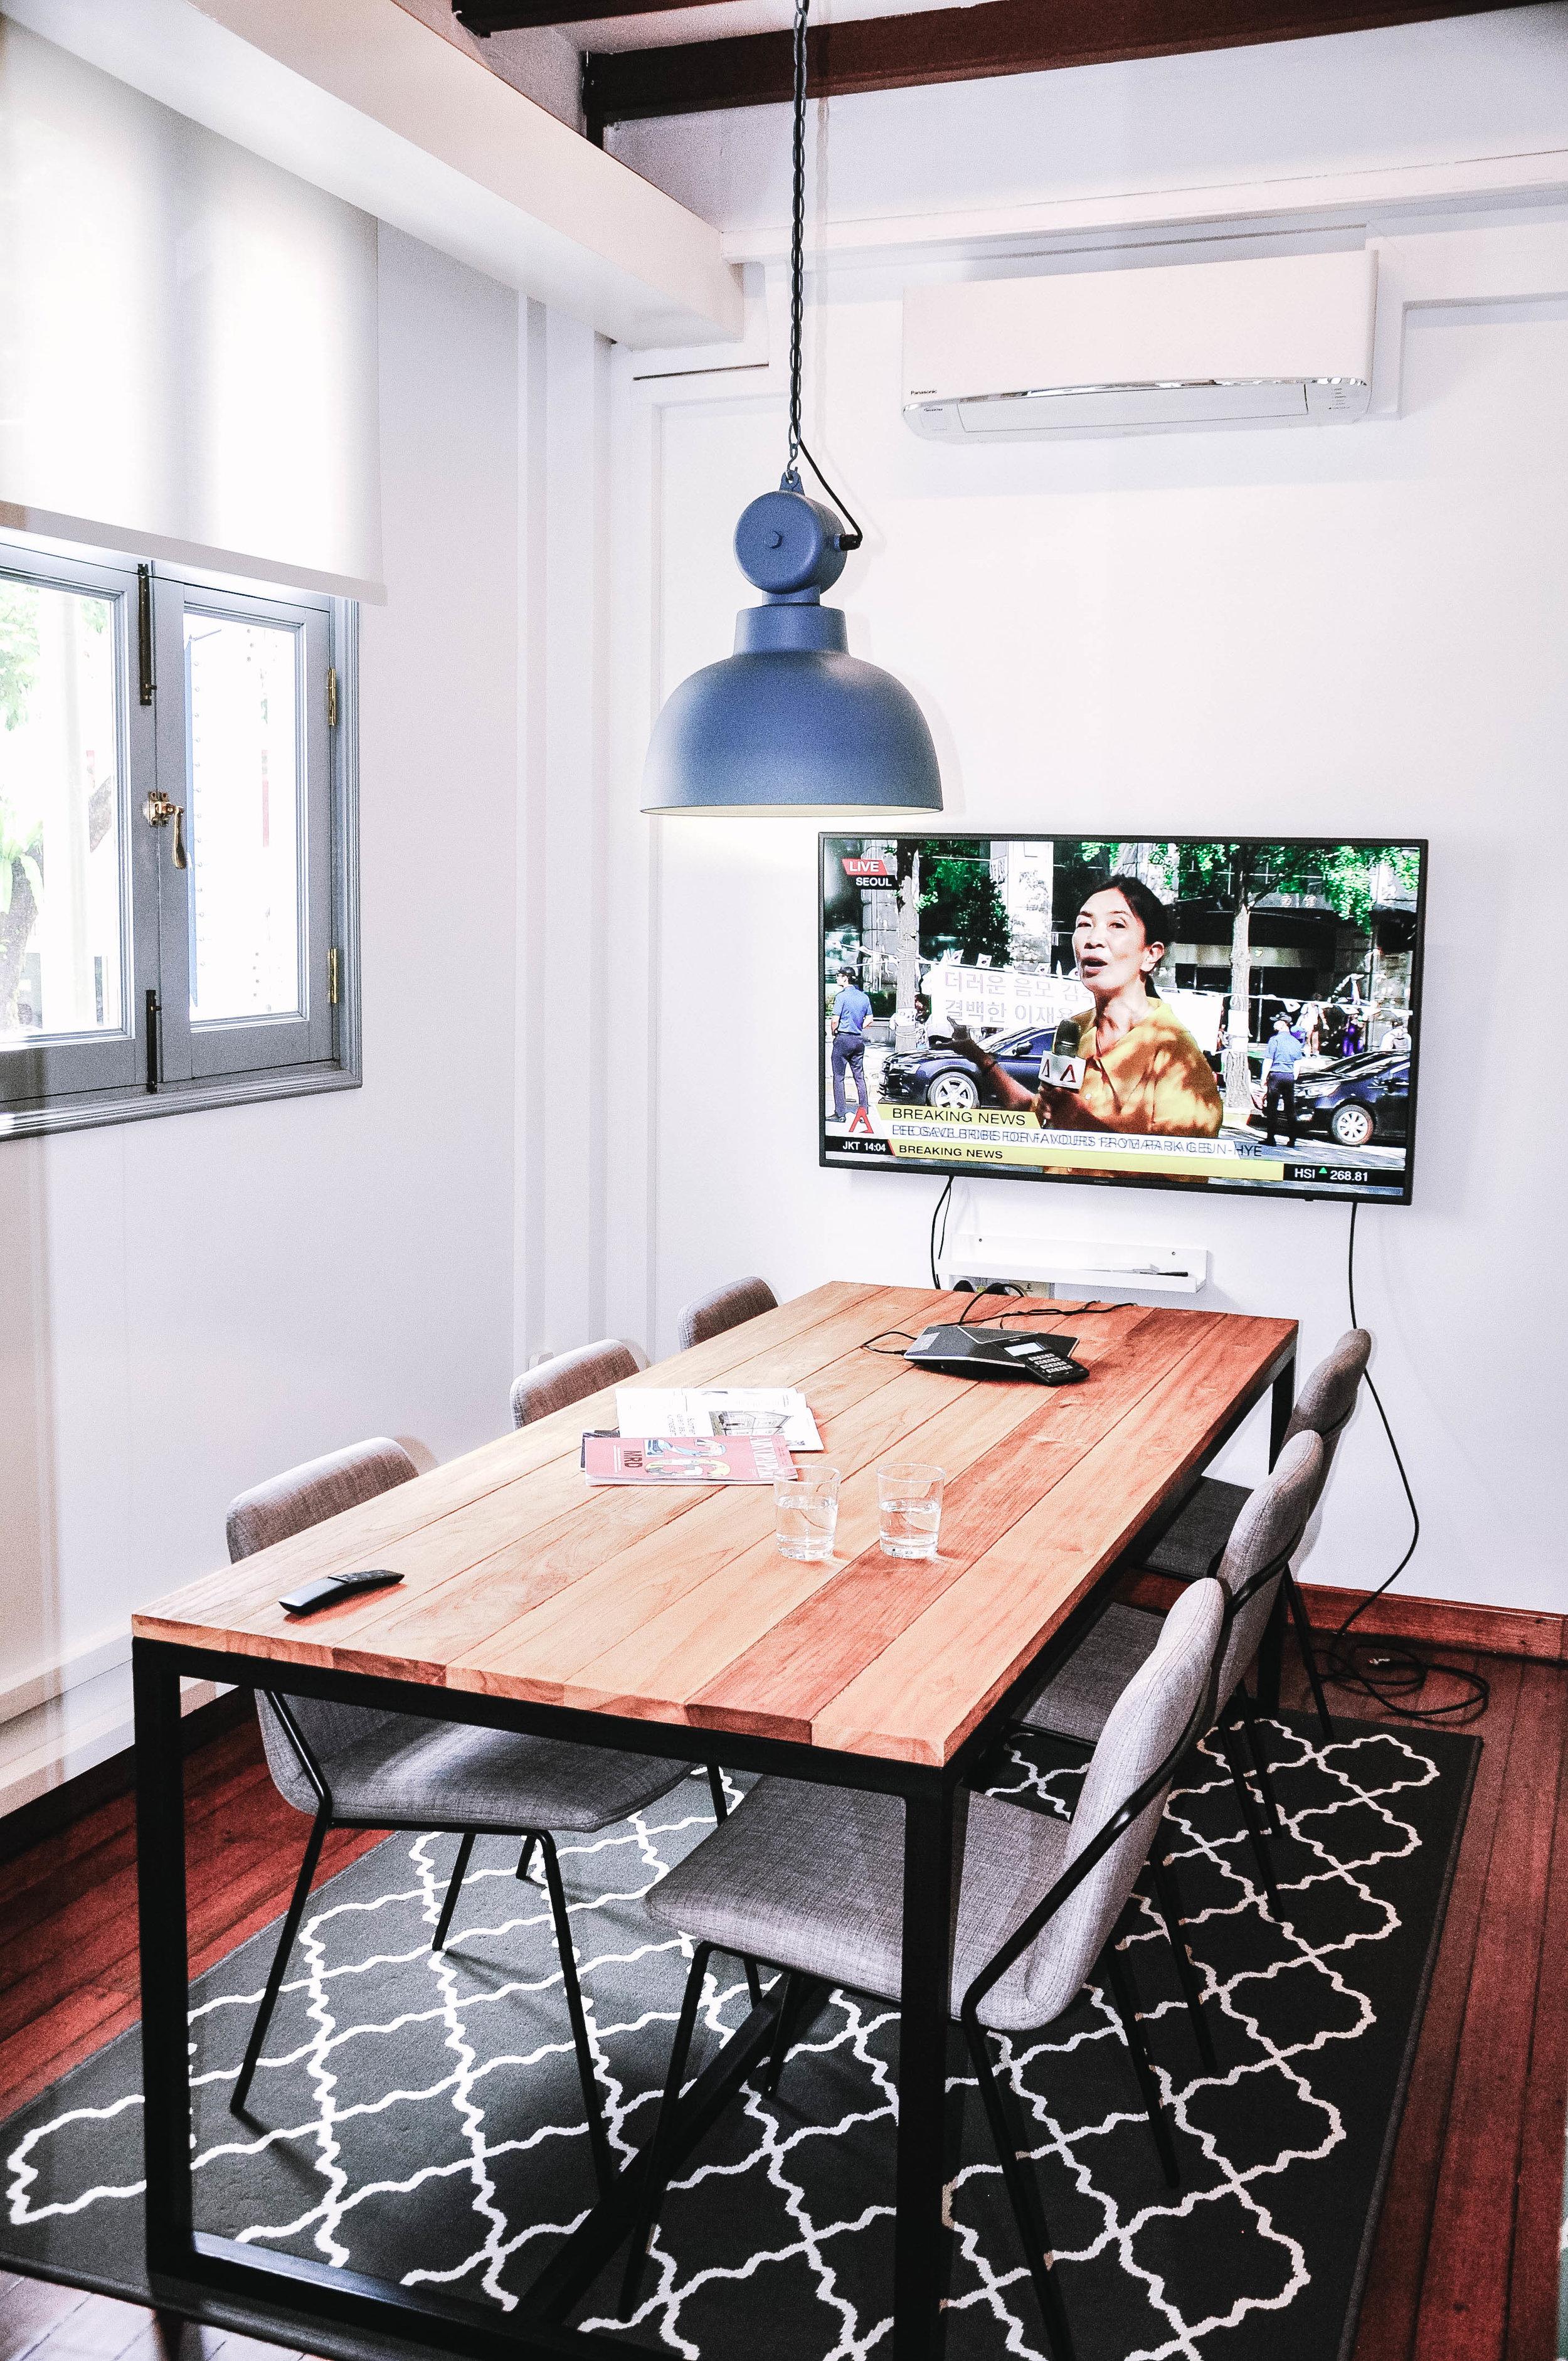 Modern Coworking Office Space Interior design